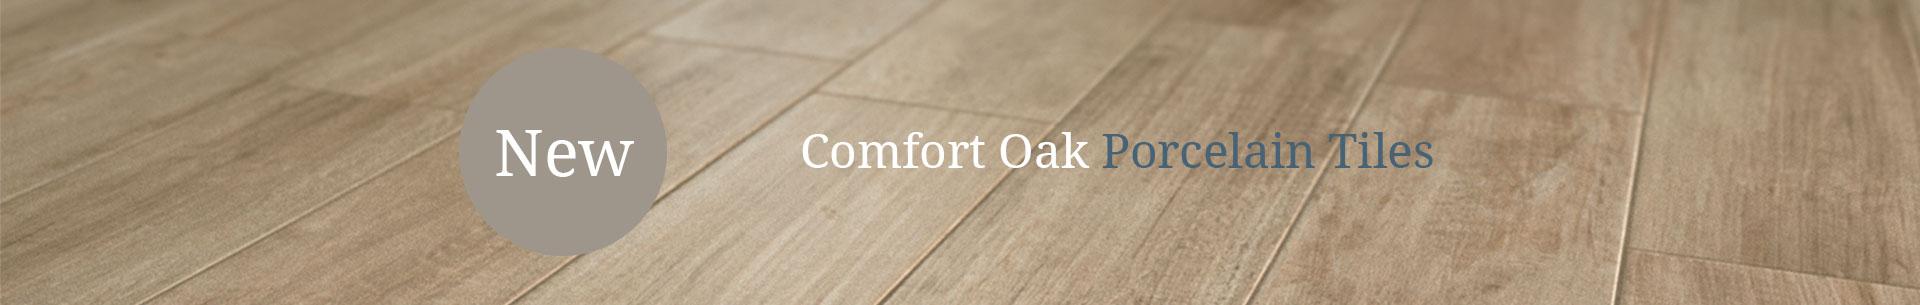 New Comfort Oak Porcelain Tiles